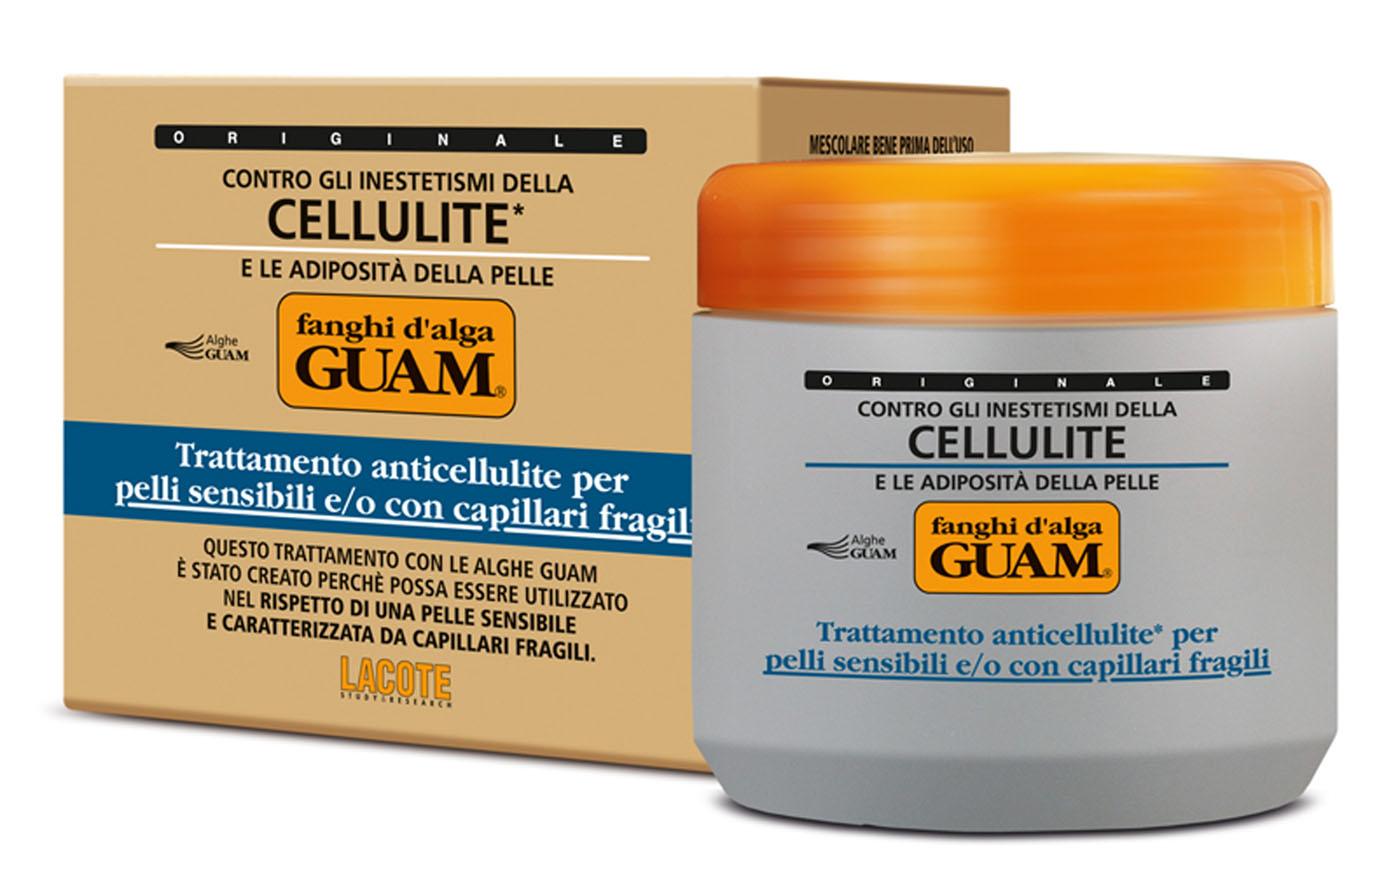 "Guam Маска антицеллюлитная ""Fanchi D'alga"" для тела, для чувствительной кожи с хрупкими капиллярами, 500 мл"